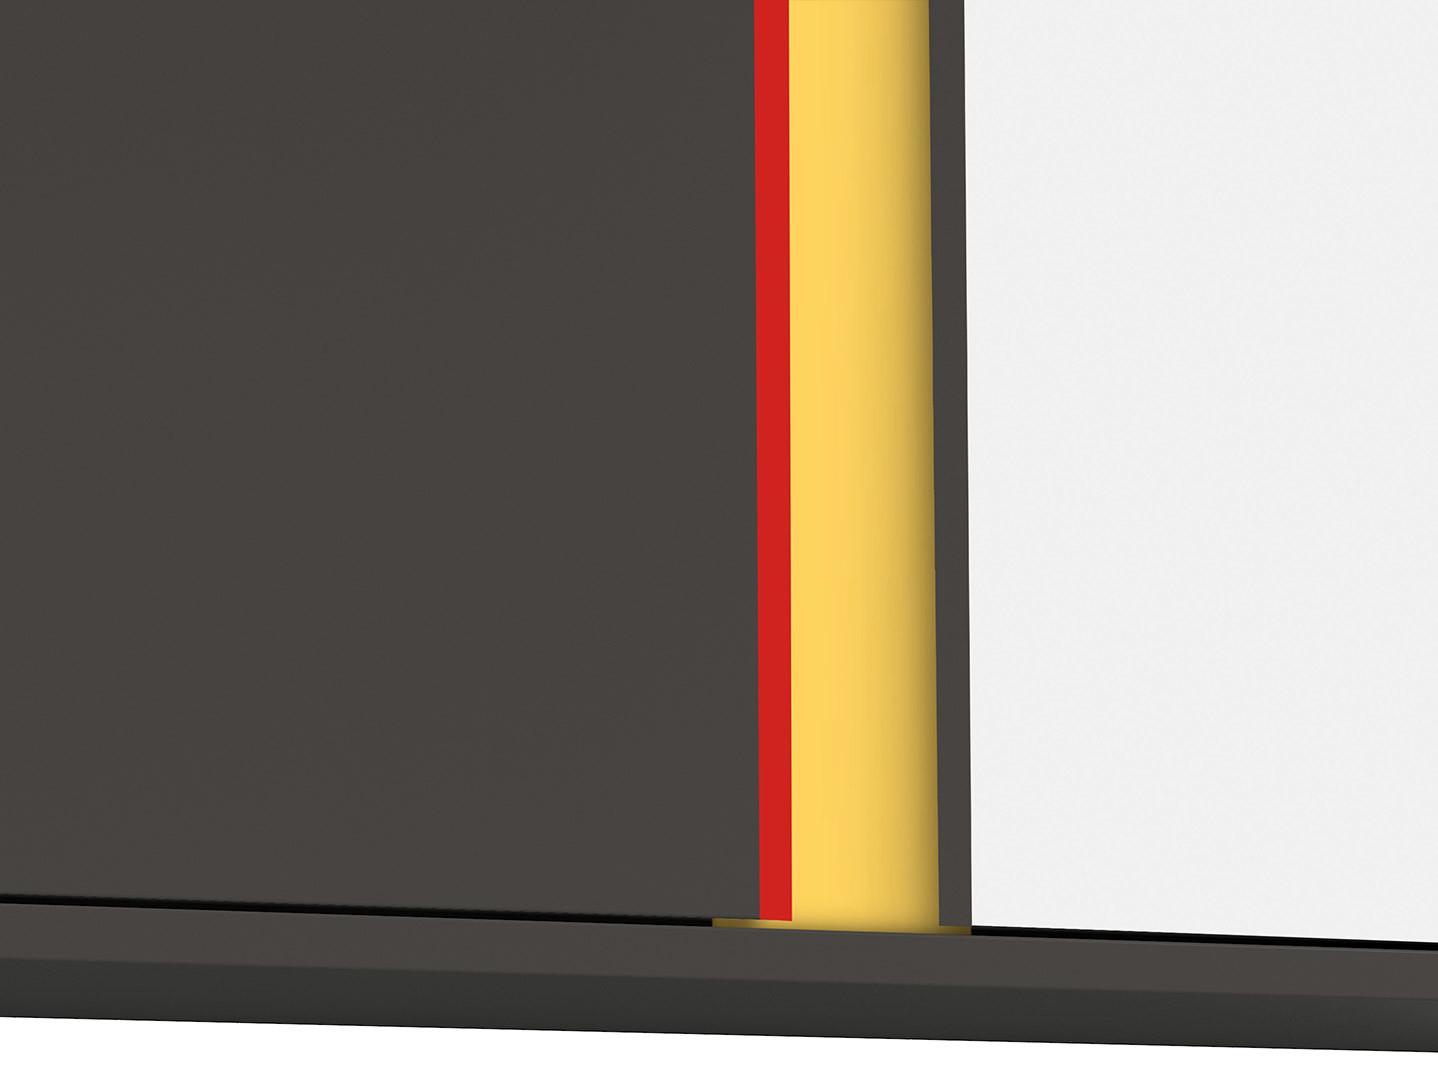 SkrinkaGRAPHIC SFW2D/86/38/B sivý wolfram/sivý wolfram/biely